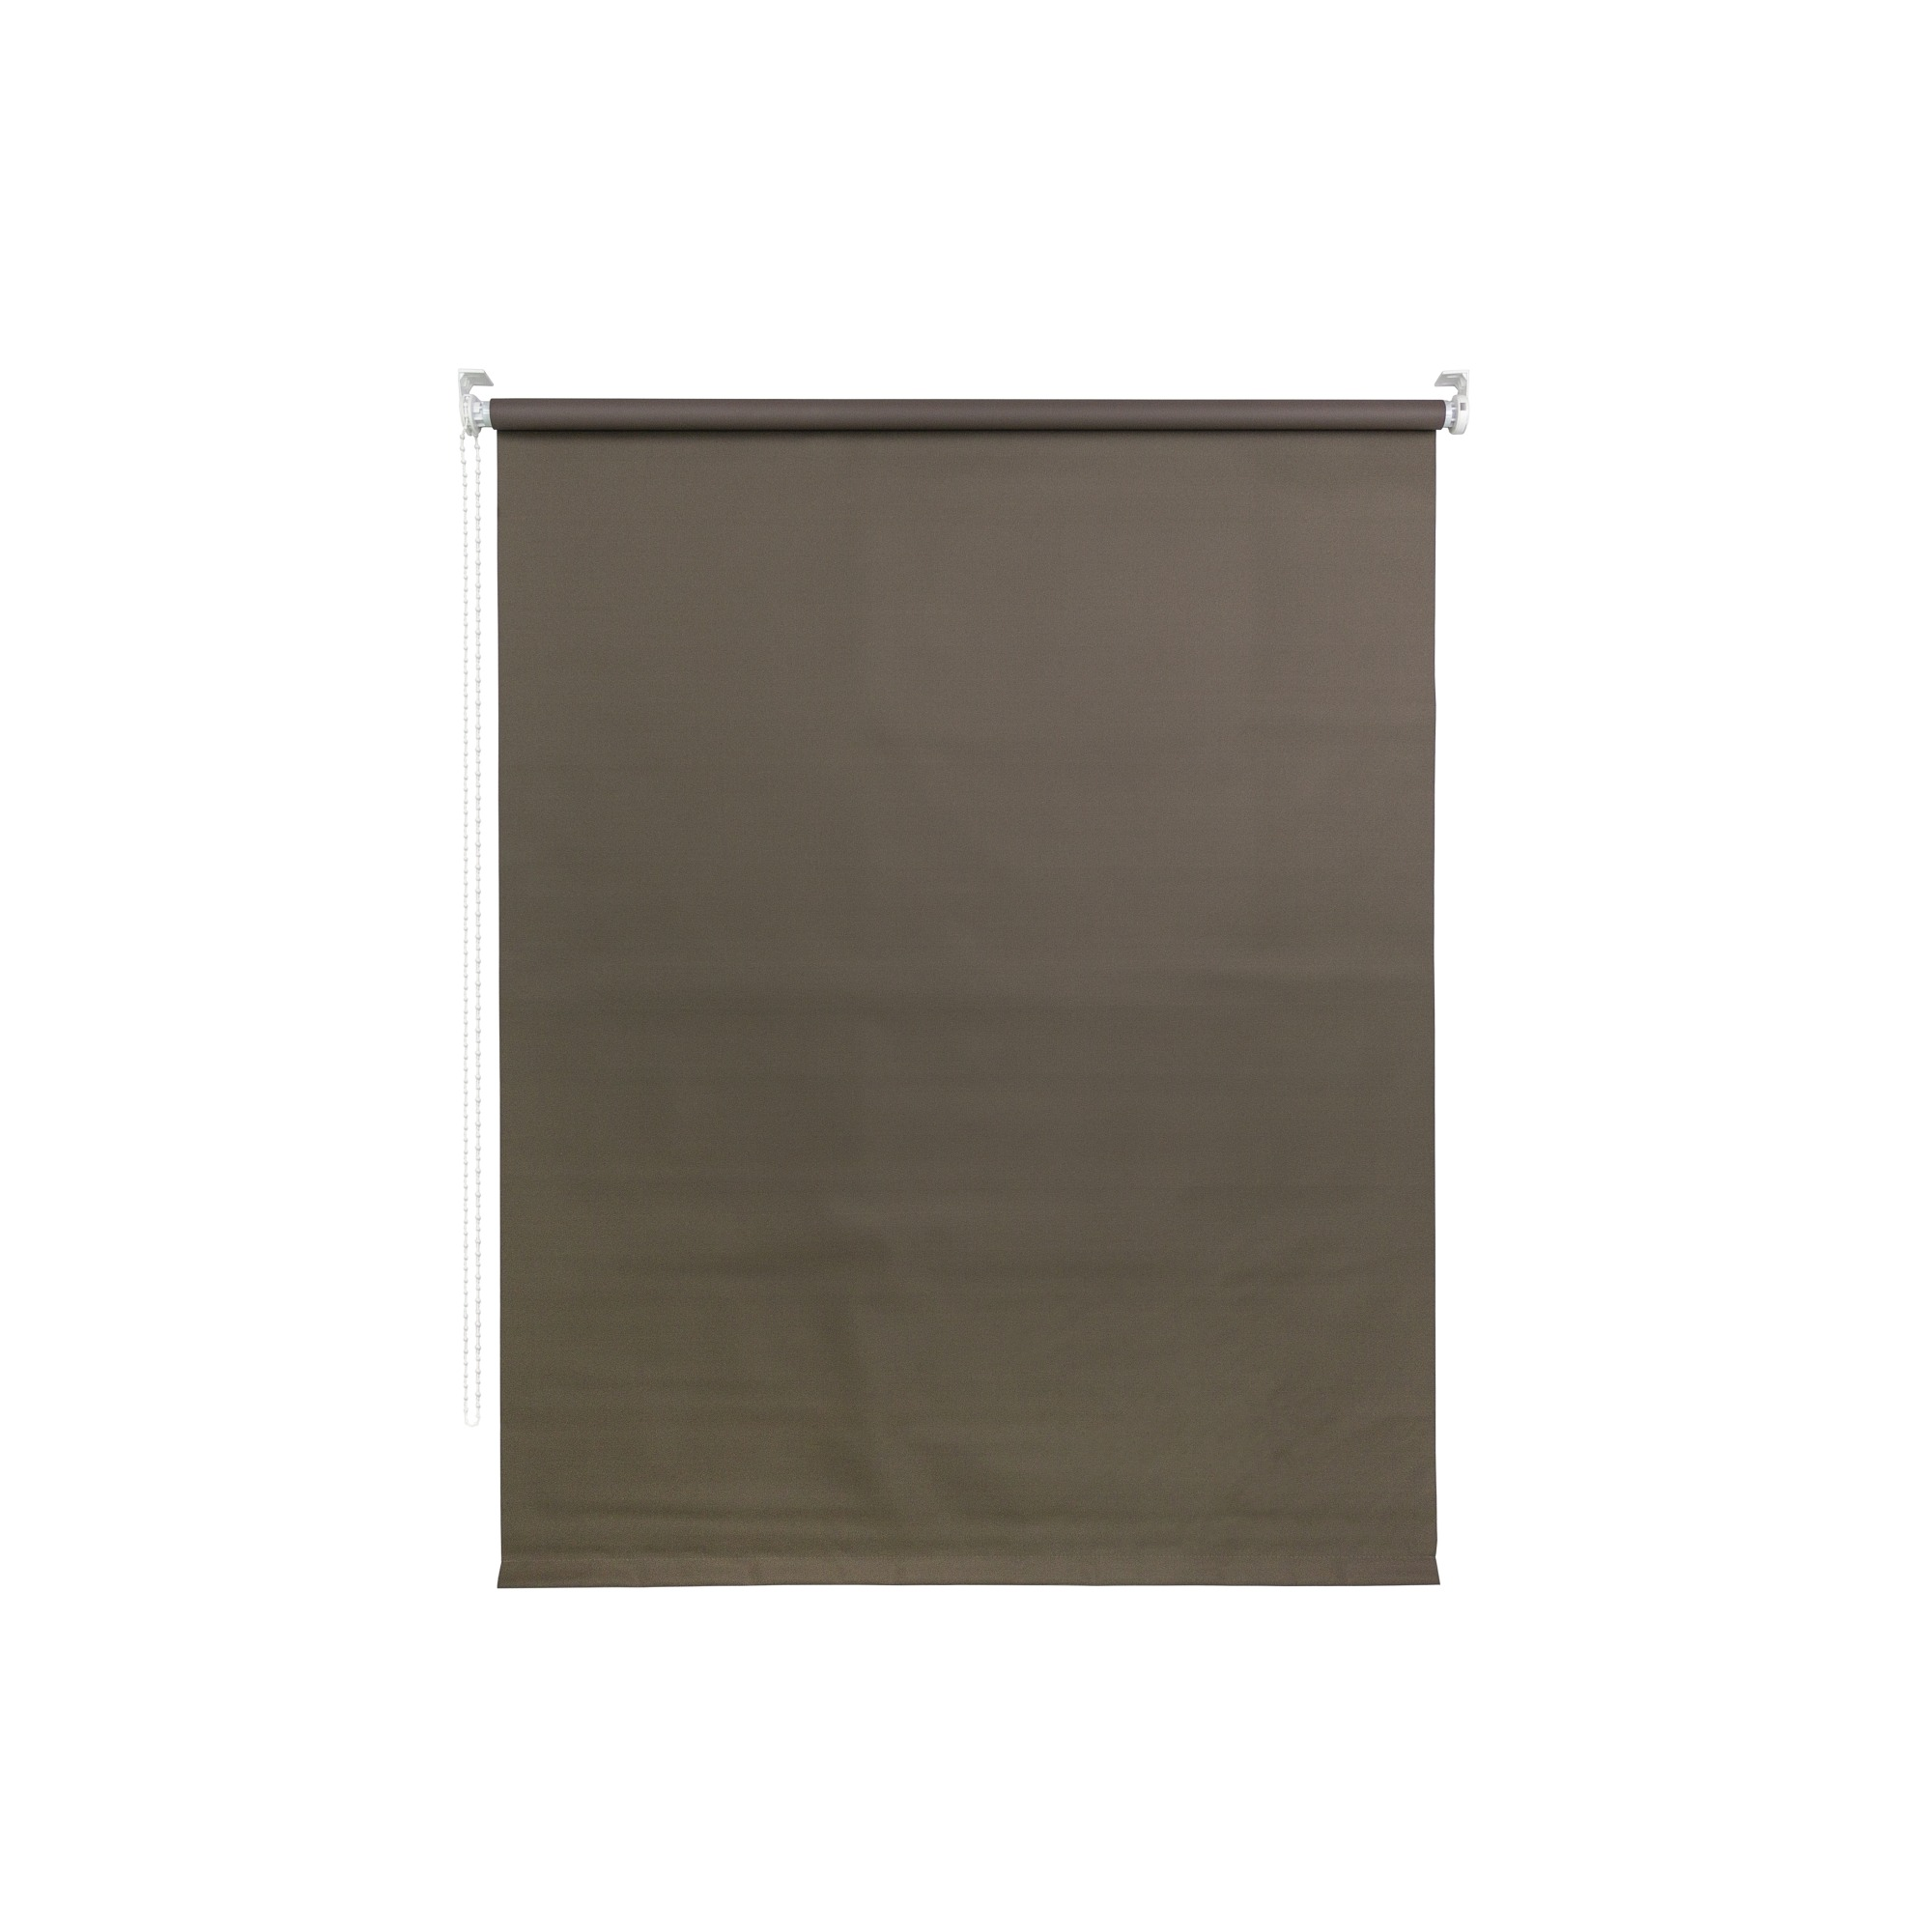 imagem de persiana rolo marrom 100x170 - jolie persianasjpg